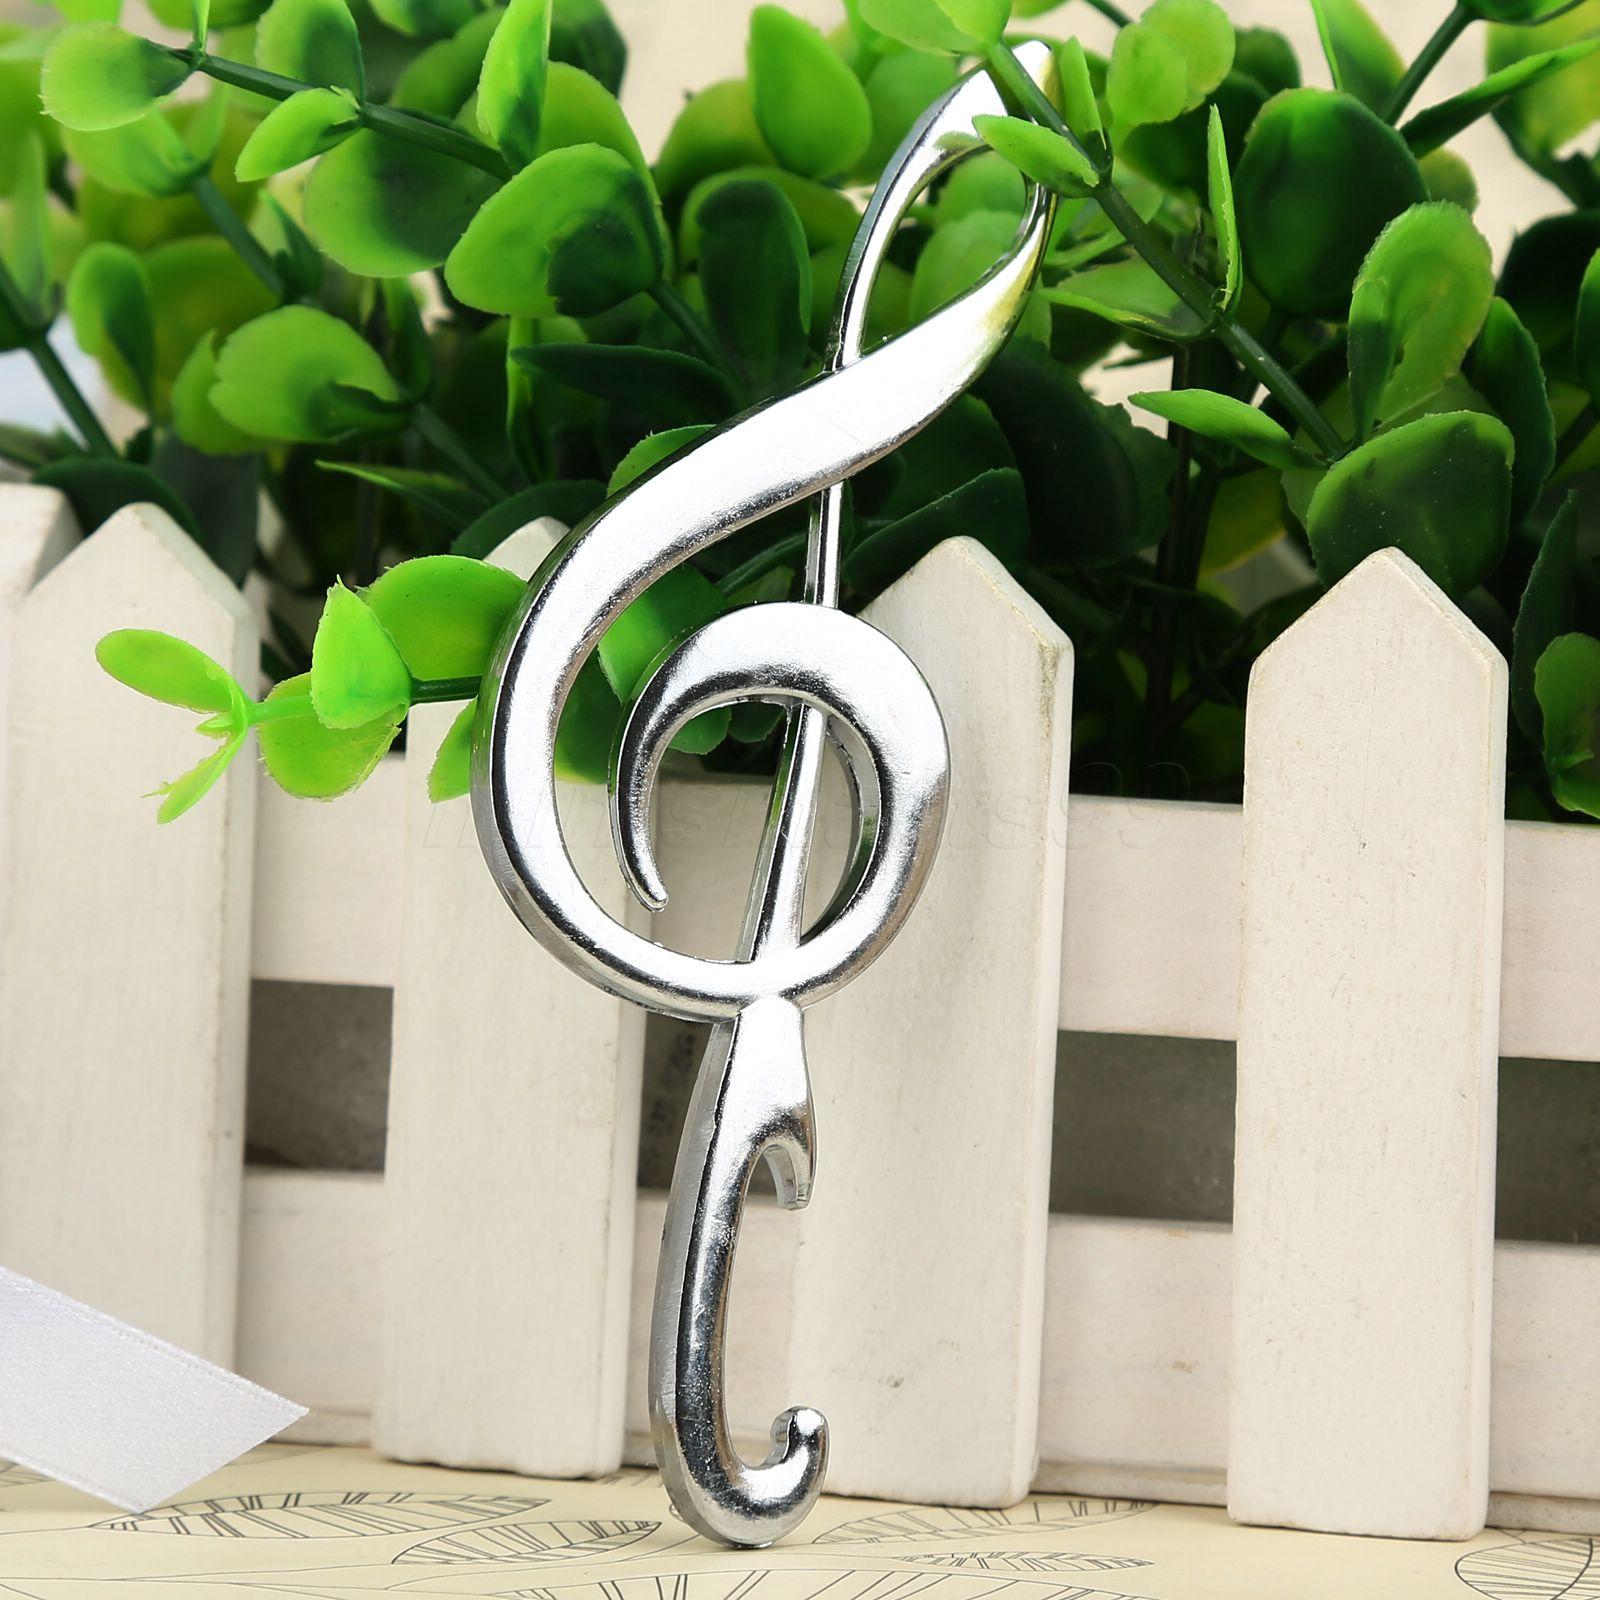 Creative Music Symbol Design Beer Bottle Opener Bridal Shower Wedding Party Birthday Favour Lovely Gift Kitchen Bar Tools